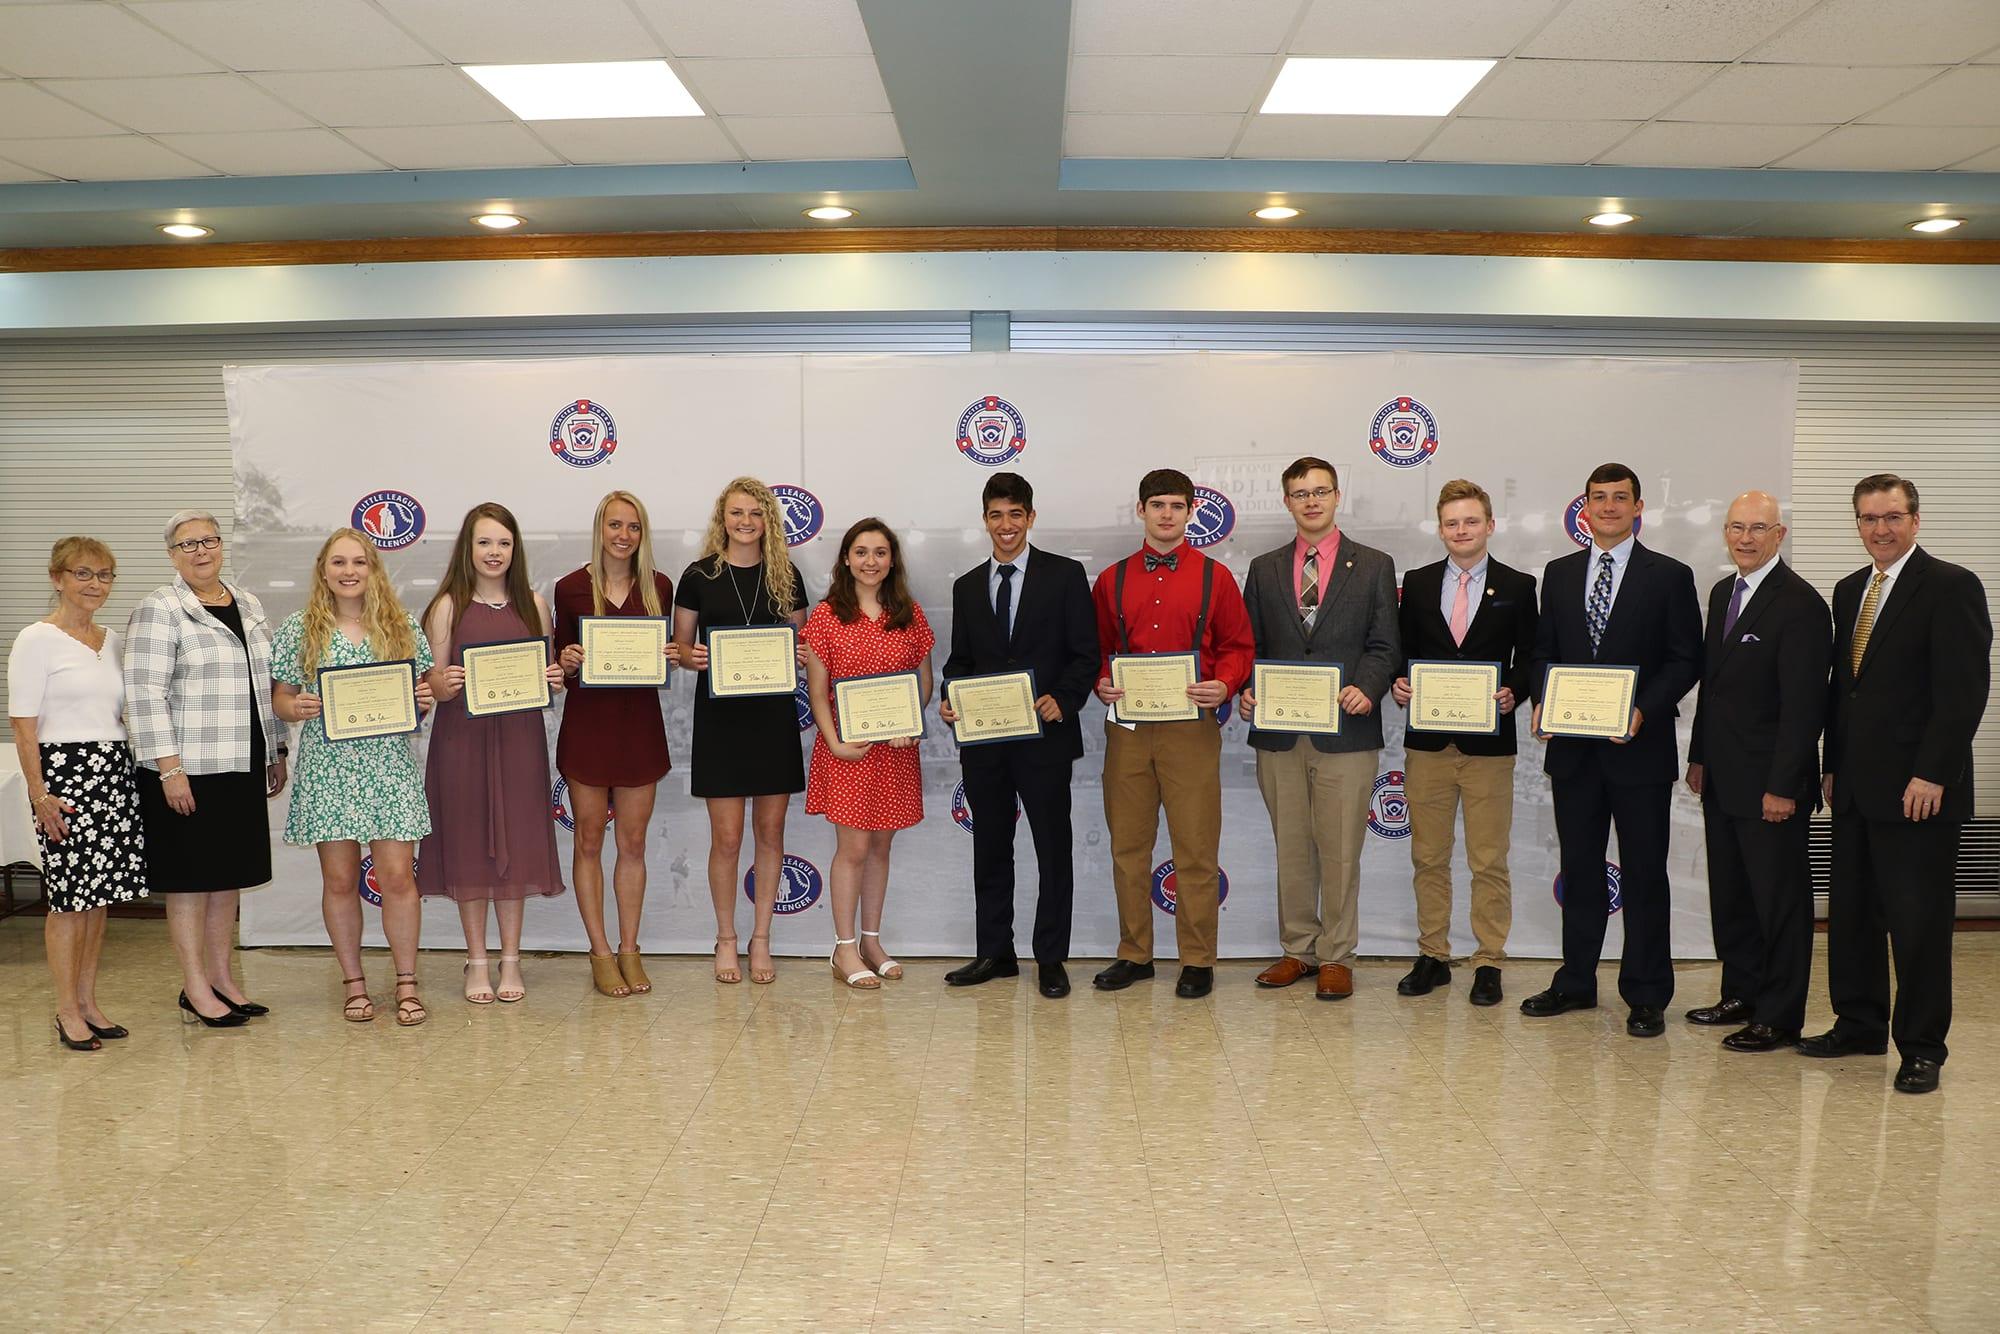 2019 Stotz Scholarship Award Recipients